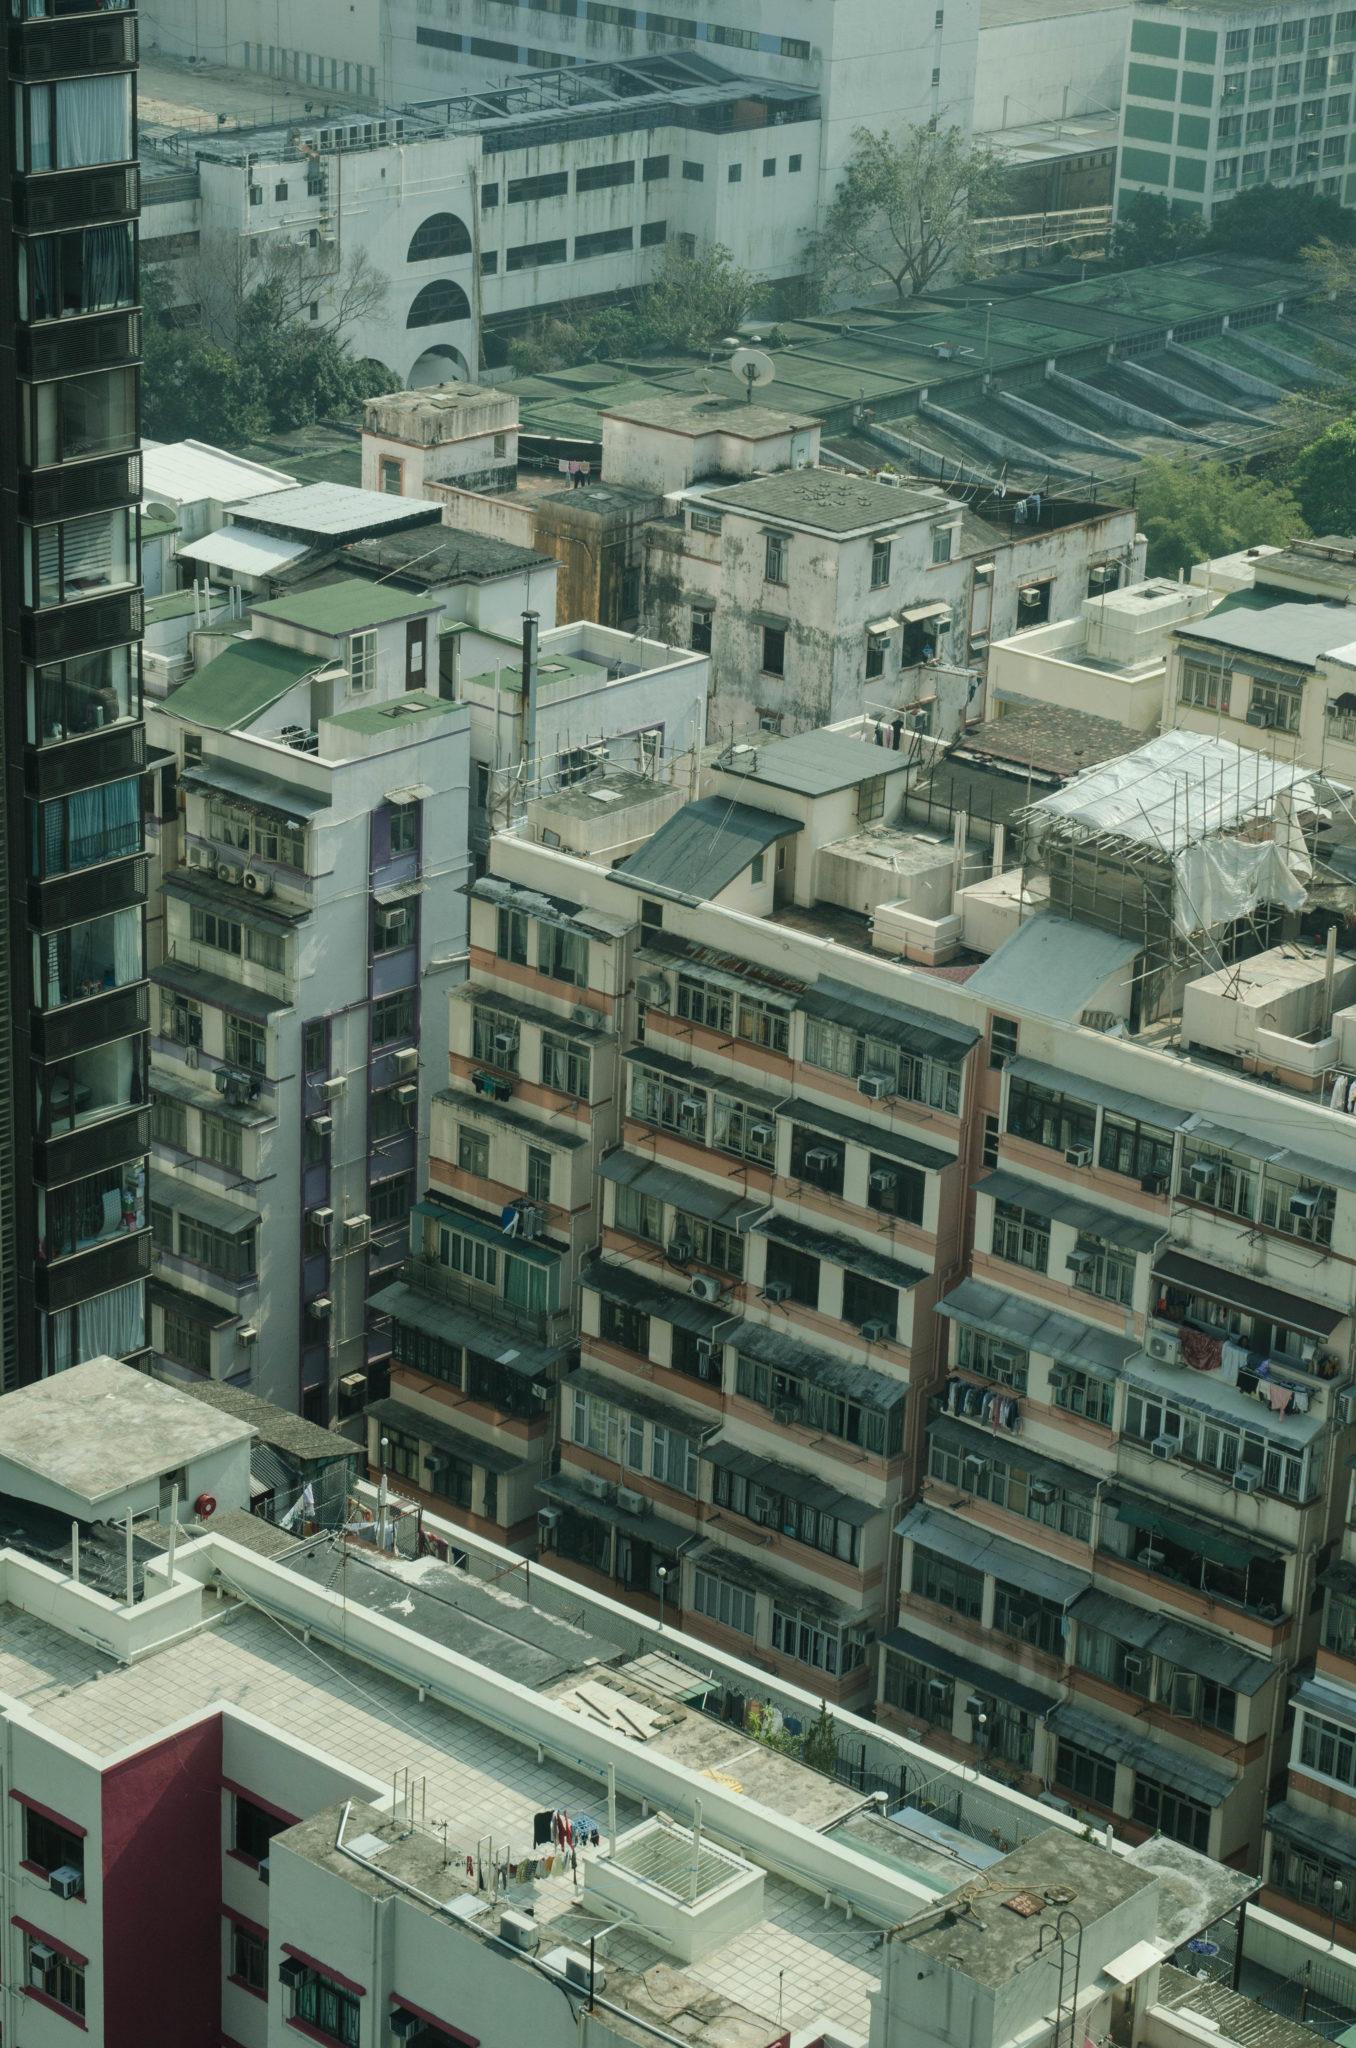 Lanson Place Hotel Hongkong: Der Ausblick von den Zimmern führt zum typischen Hongkong Flair